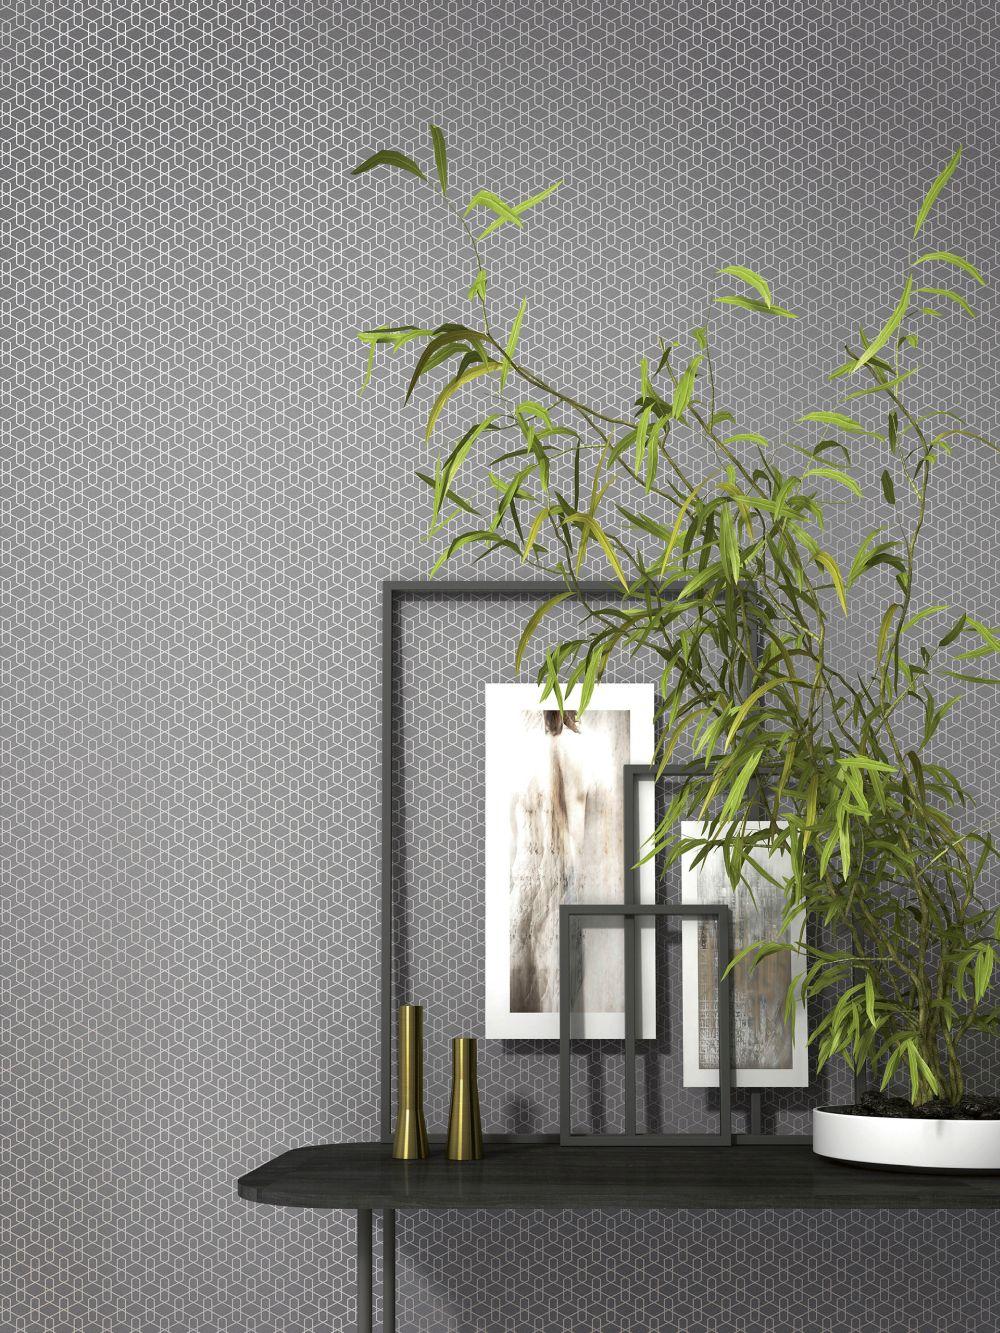 Vlies tapete grafisch 3d grau glitzer rasch cato 800906 for 3d tapete grau